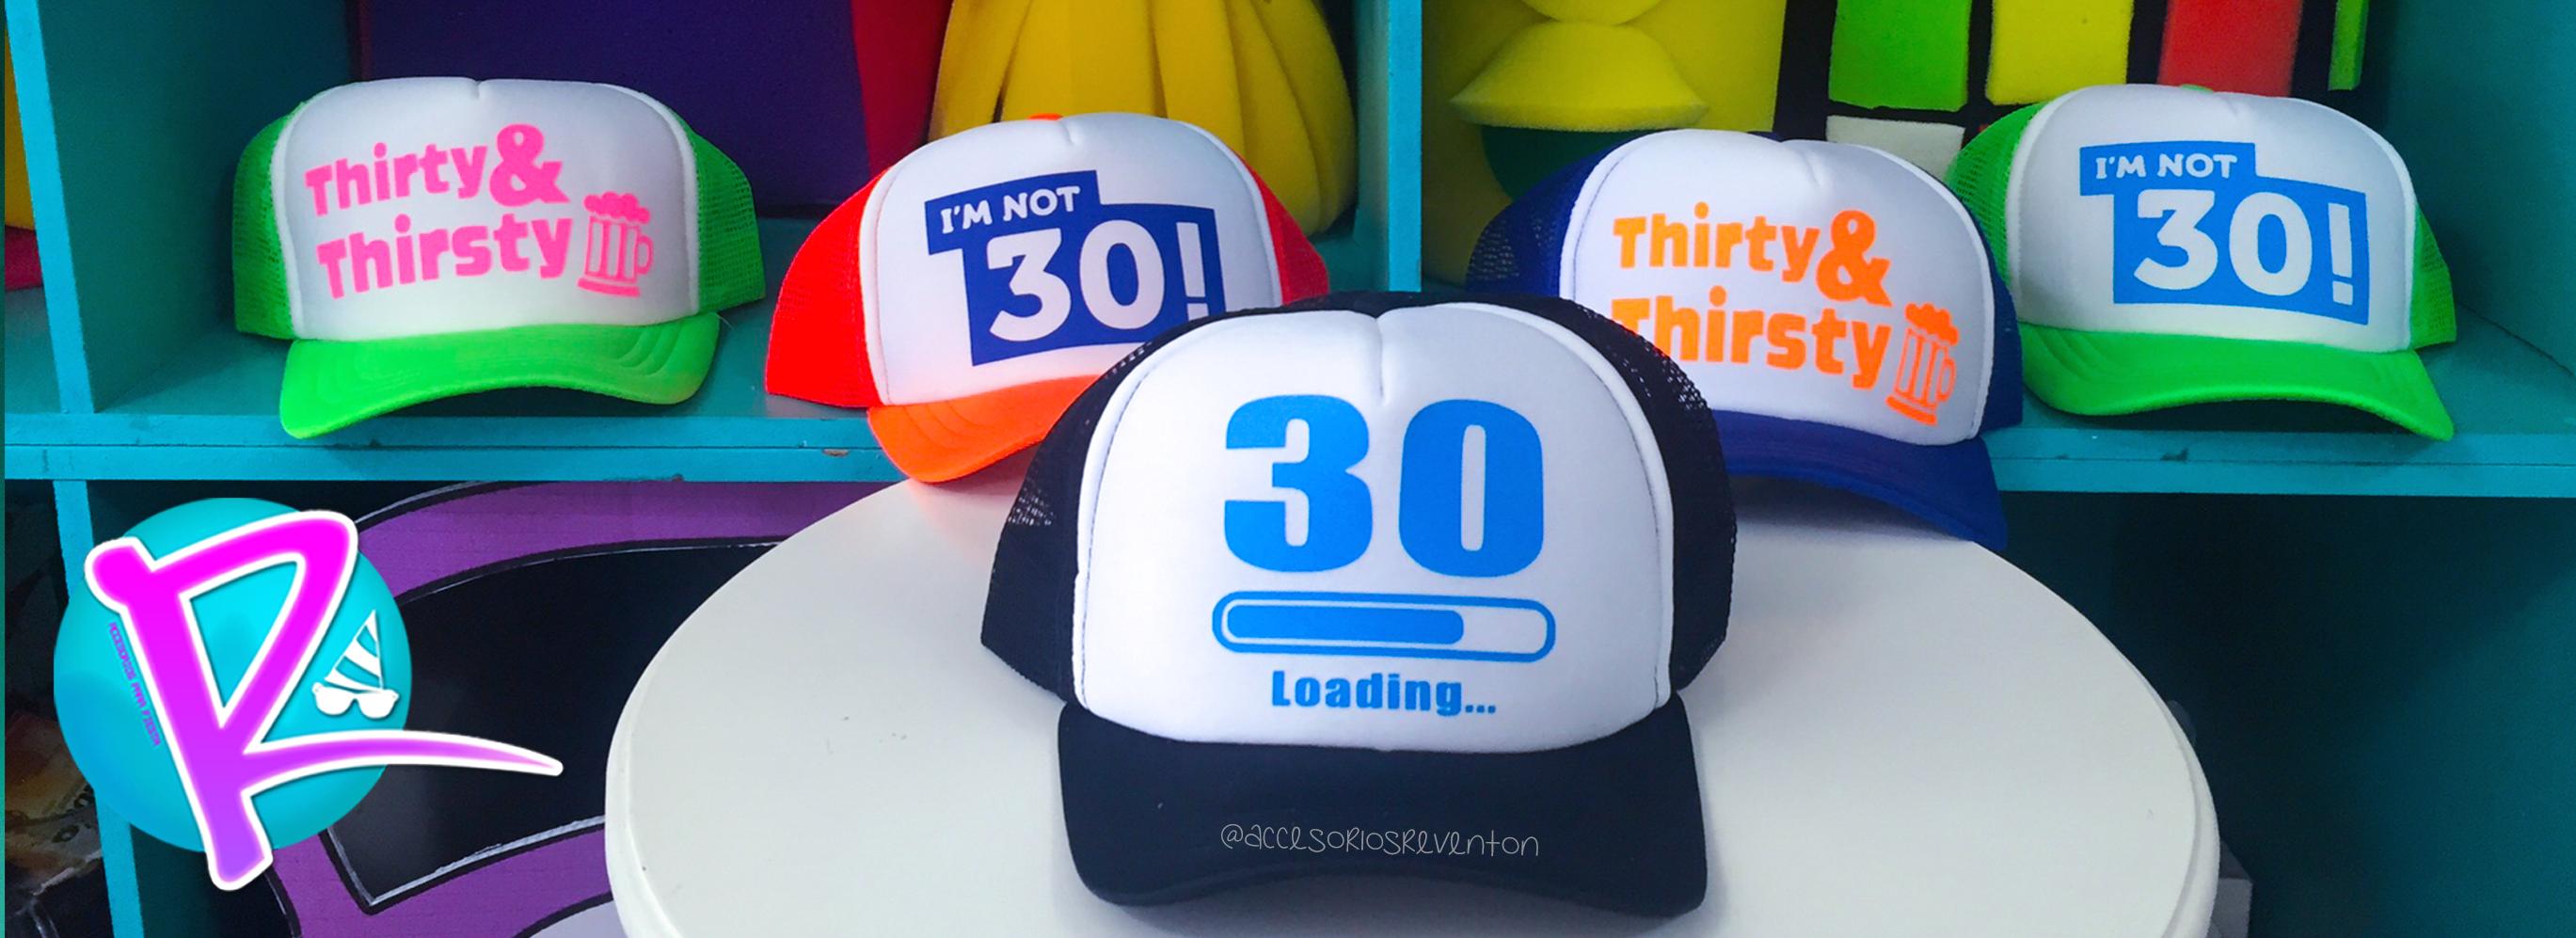 41c77985f5d6f Personaliza tu fiesta de cumpleaños!  cachuchaspersonalizadas  im30   thityandthisty